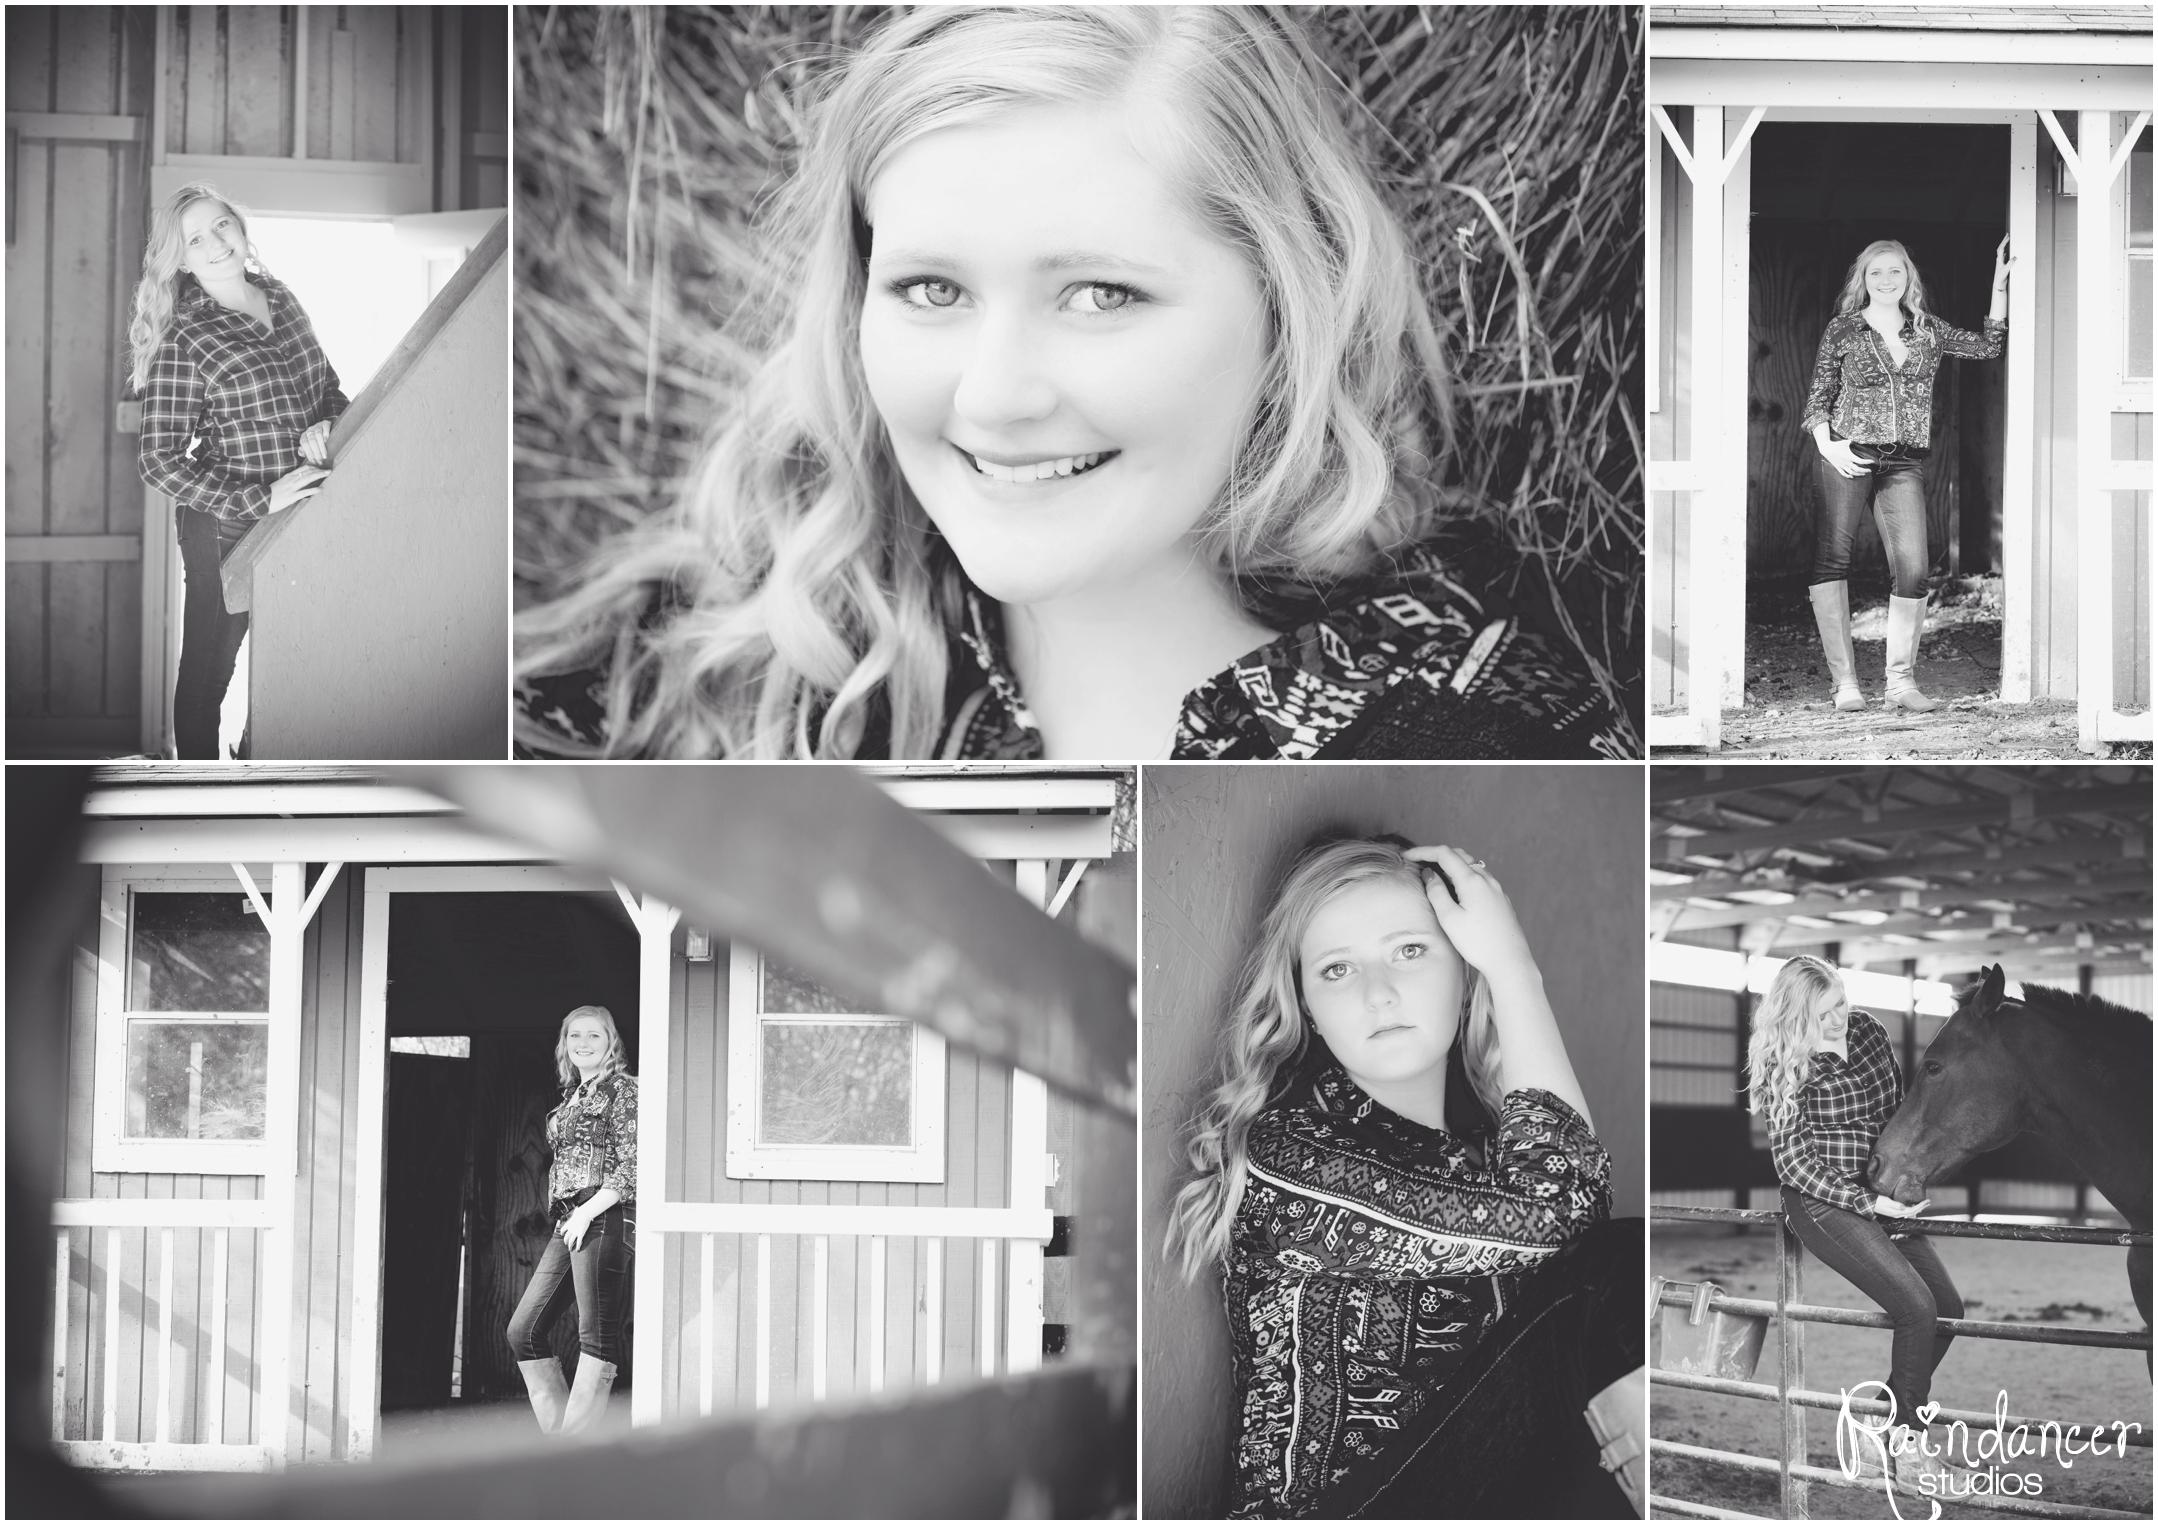 Indianapolis High School Senior Photographer, Indy Senior Photographer, Indy Senior Photography, Indianapolis Senior Photography, Indy Portrait Photographer, Senior girl Photography, Indy Senior girl photographer